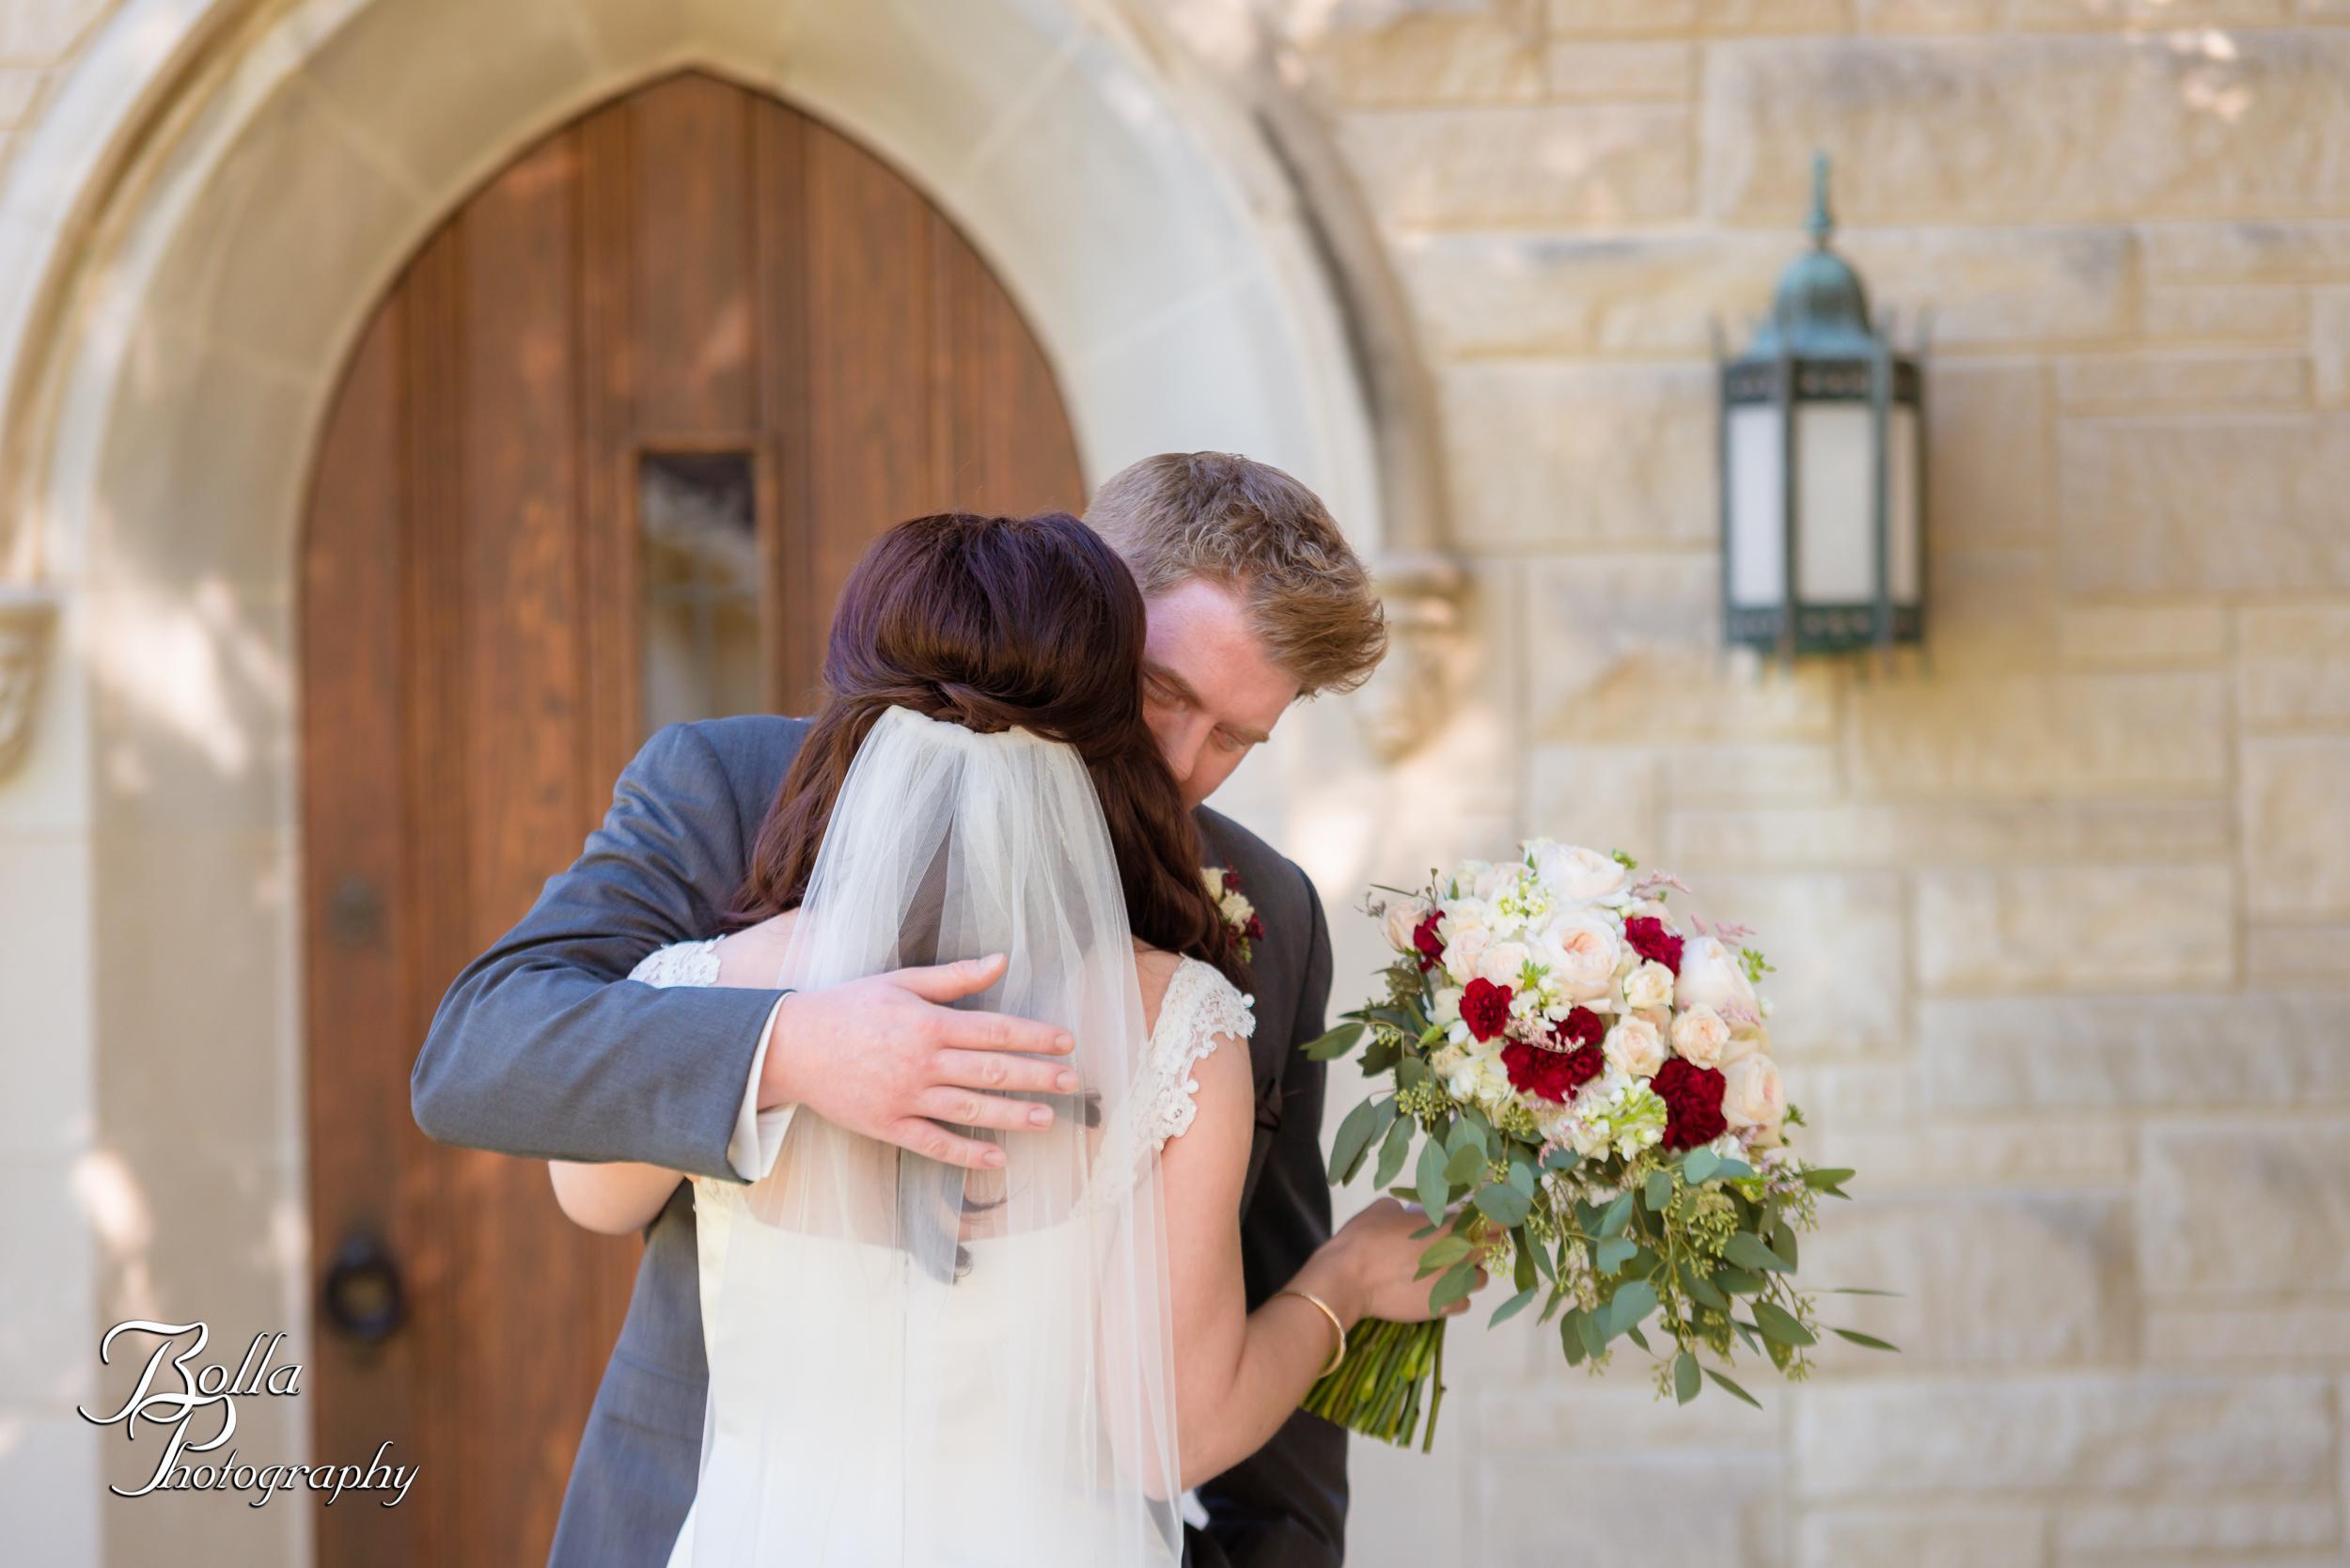 Bolla_photography_edwardsville_wedding_photographer_st_louis_weddings_Reilmann-0077.jpg